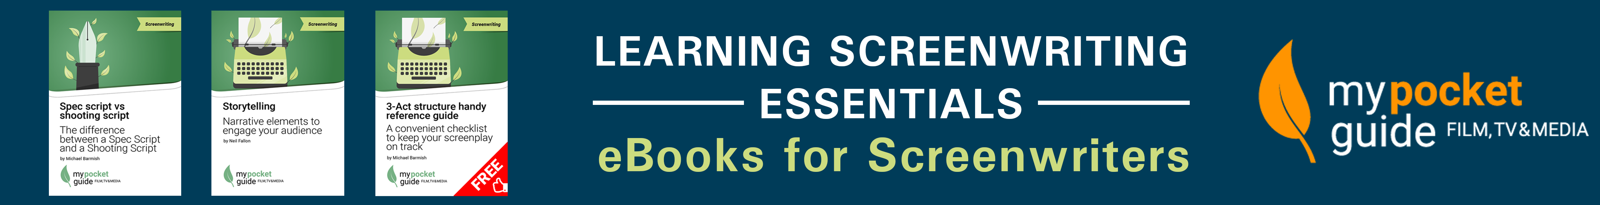 screenwriting ebooks